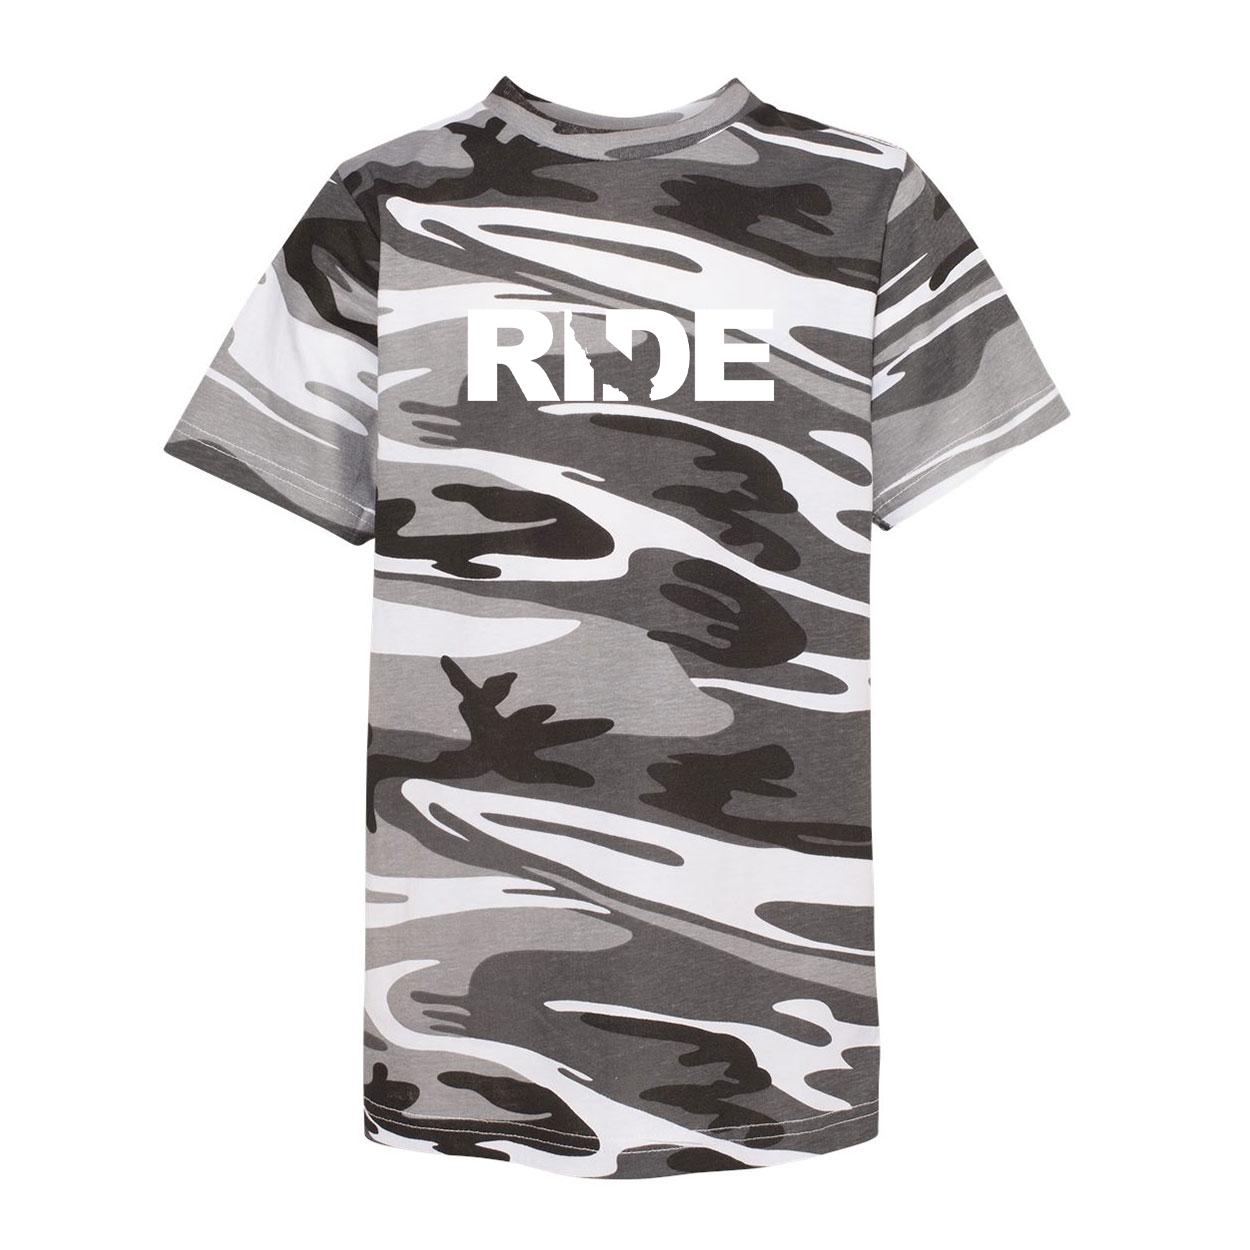 Ride California Classic Youth Unisex T-Shirt Urban Camo (White Logo)